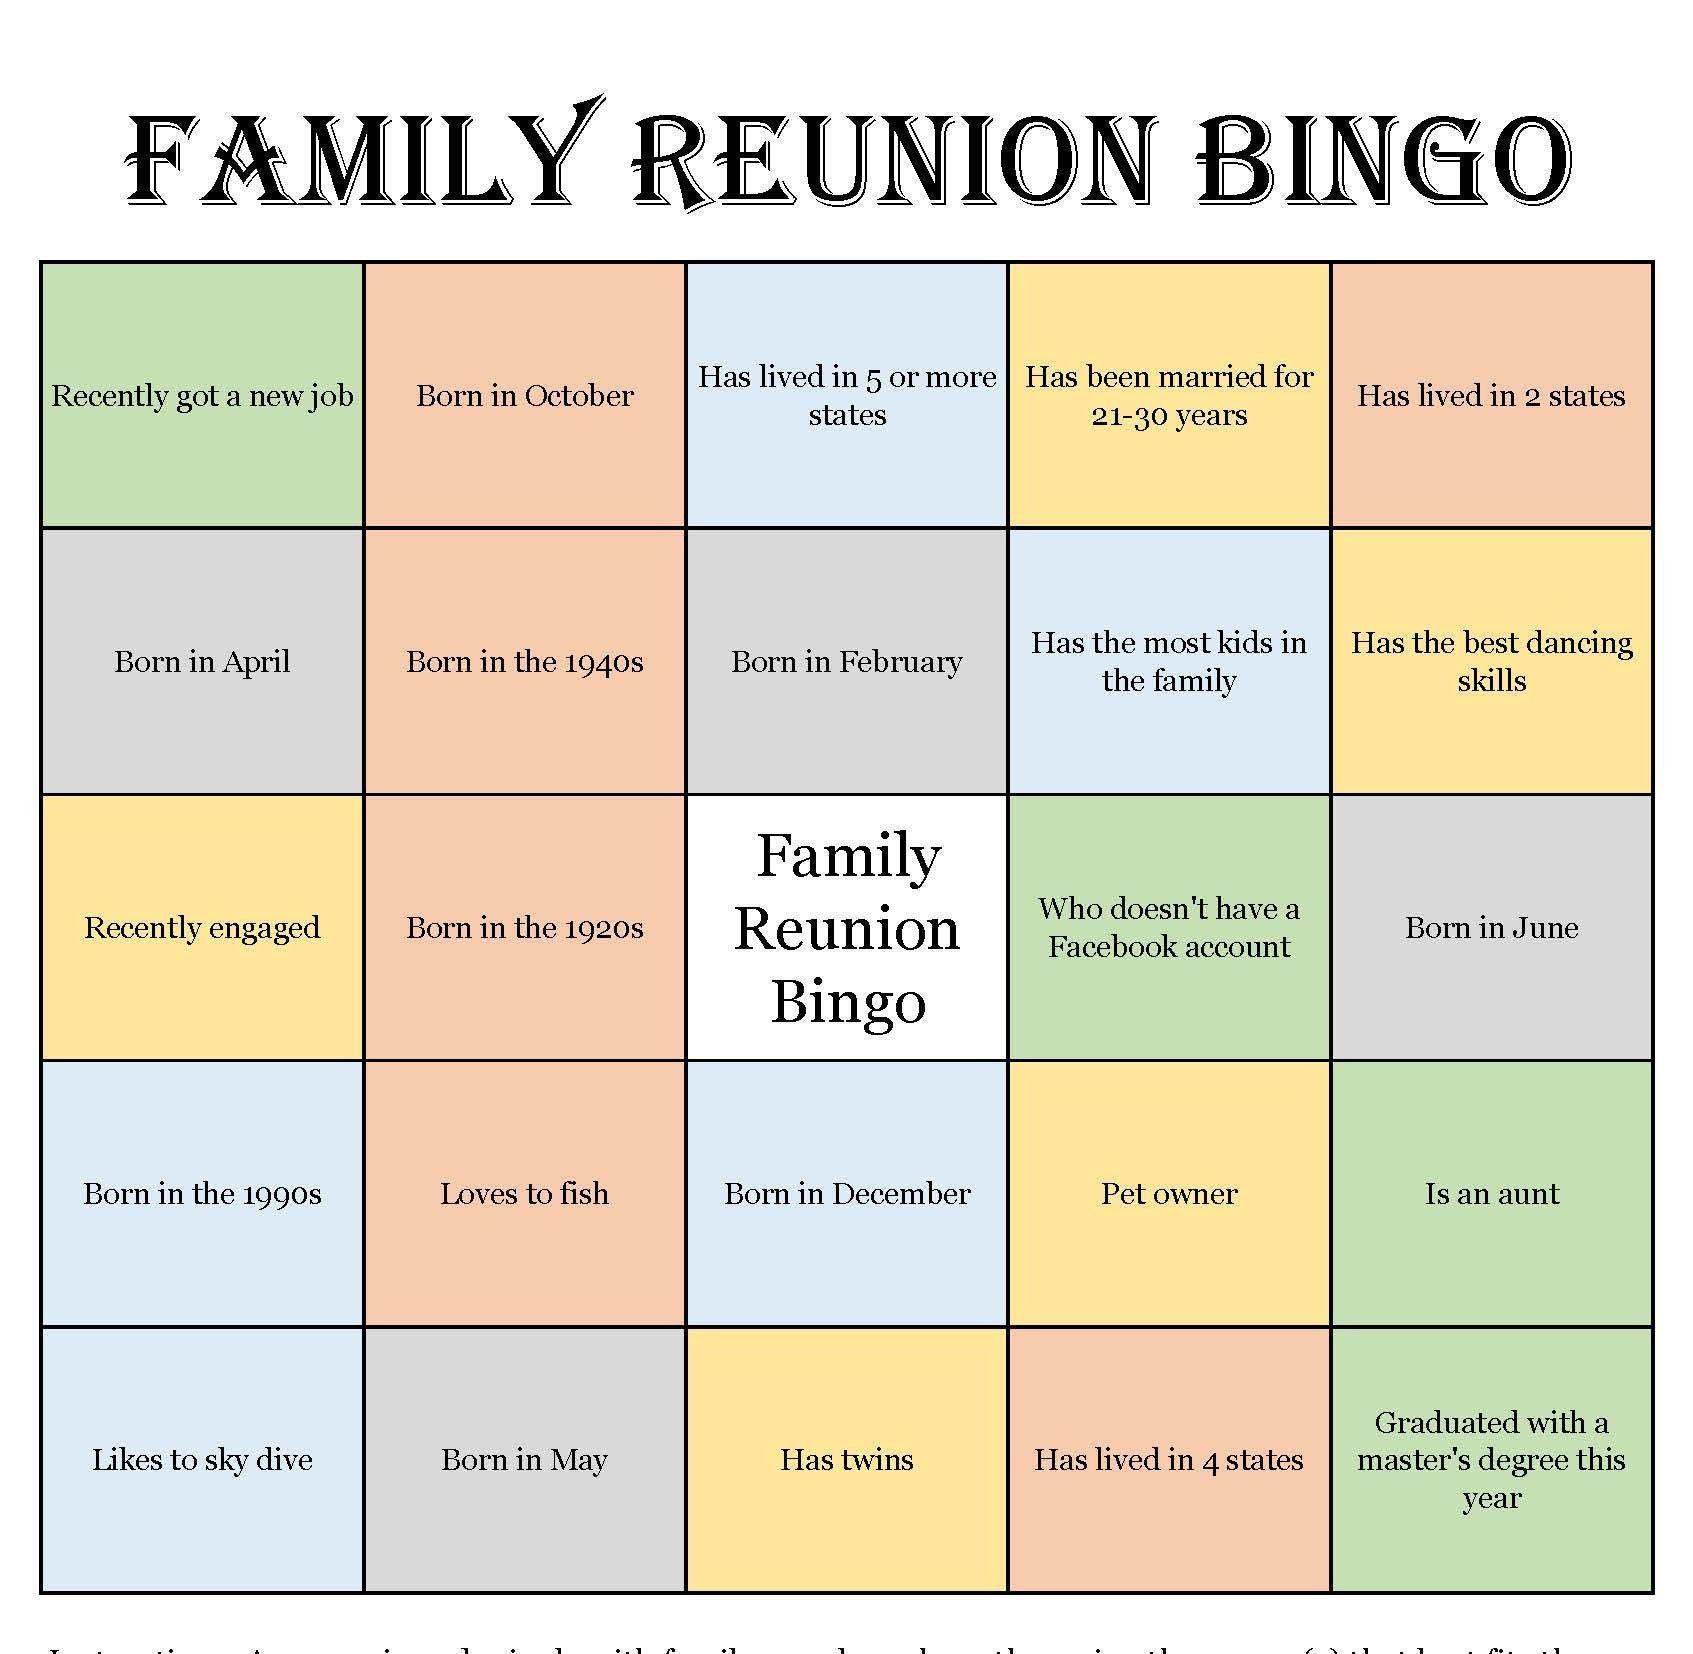 Family Reunion Bingo Cards (Mix & Mingle Style Bingo